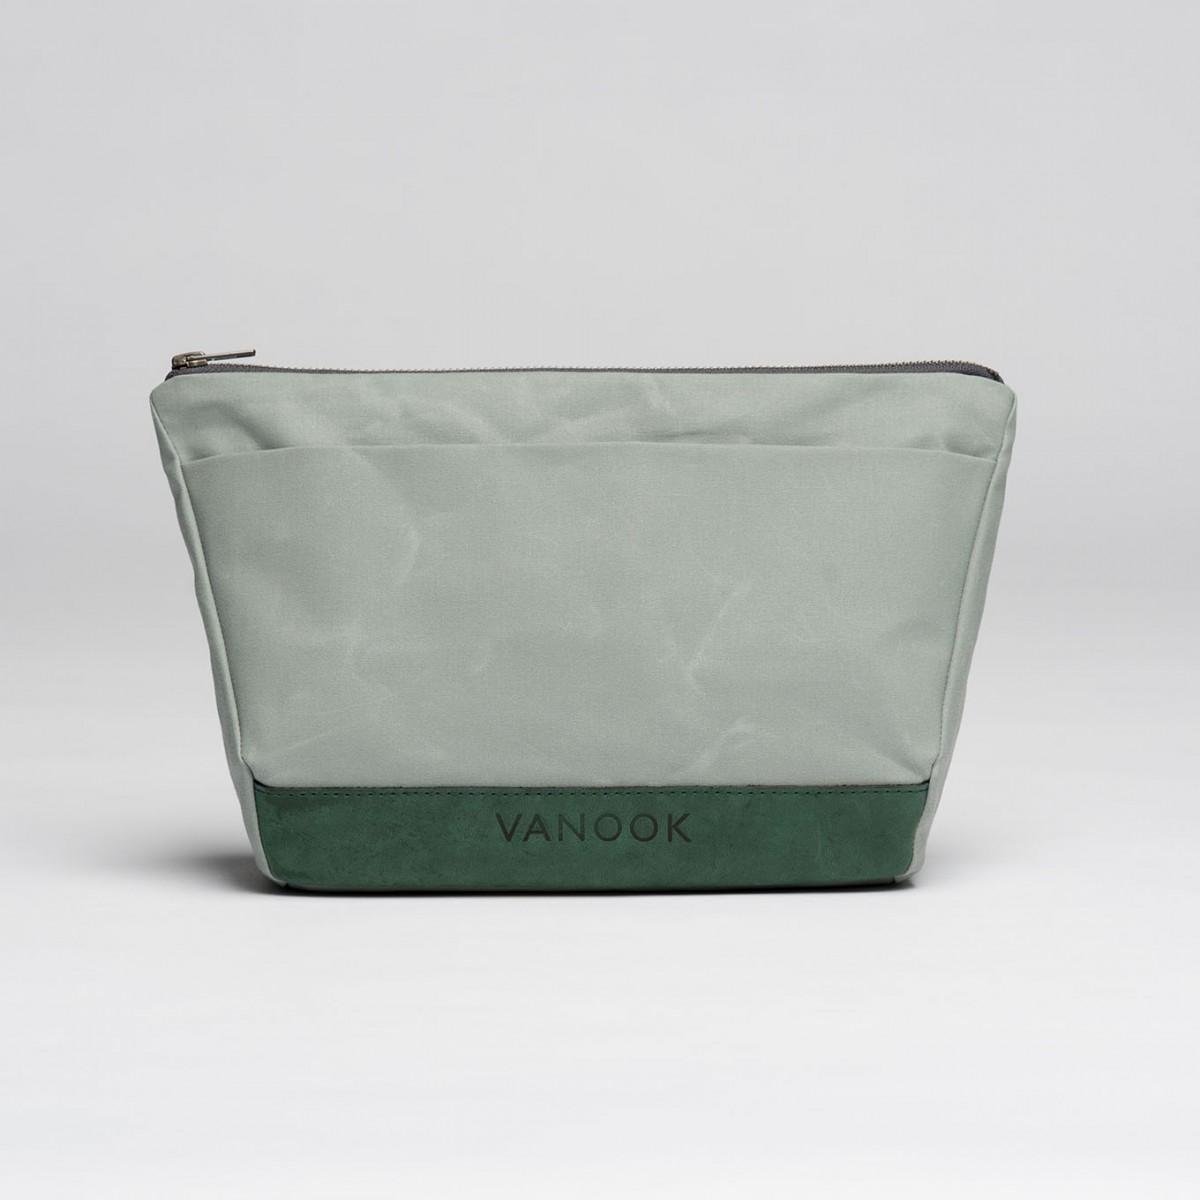 VANOOK Wash Bag Oyster / Malachite